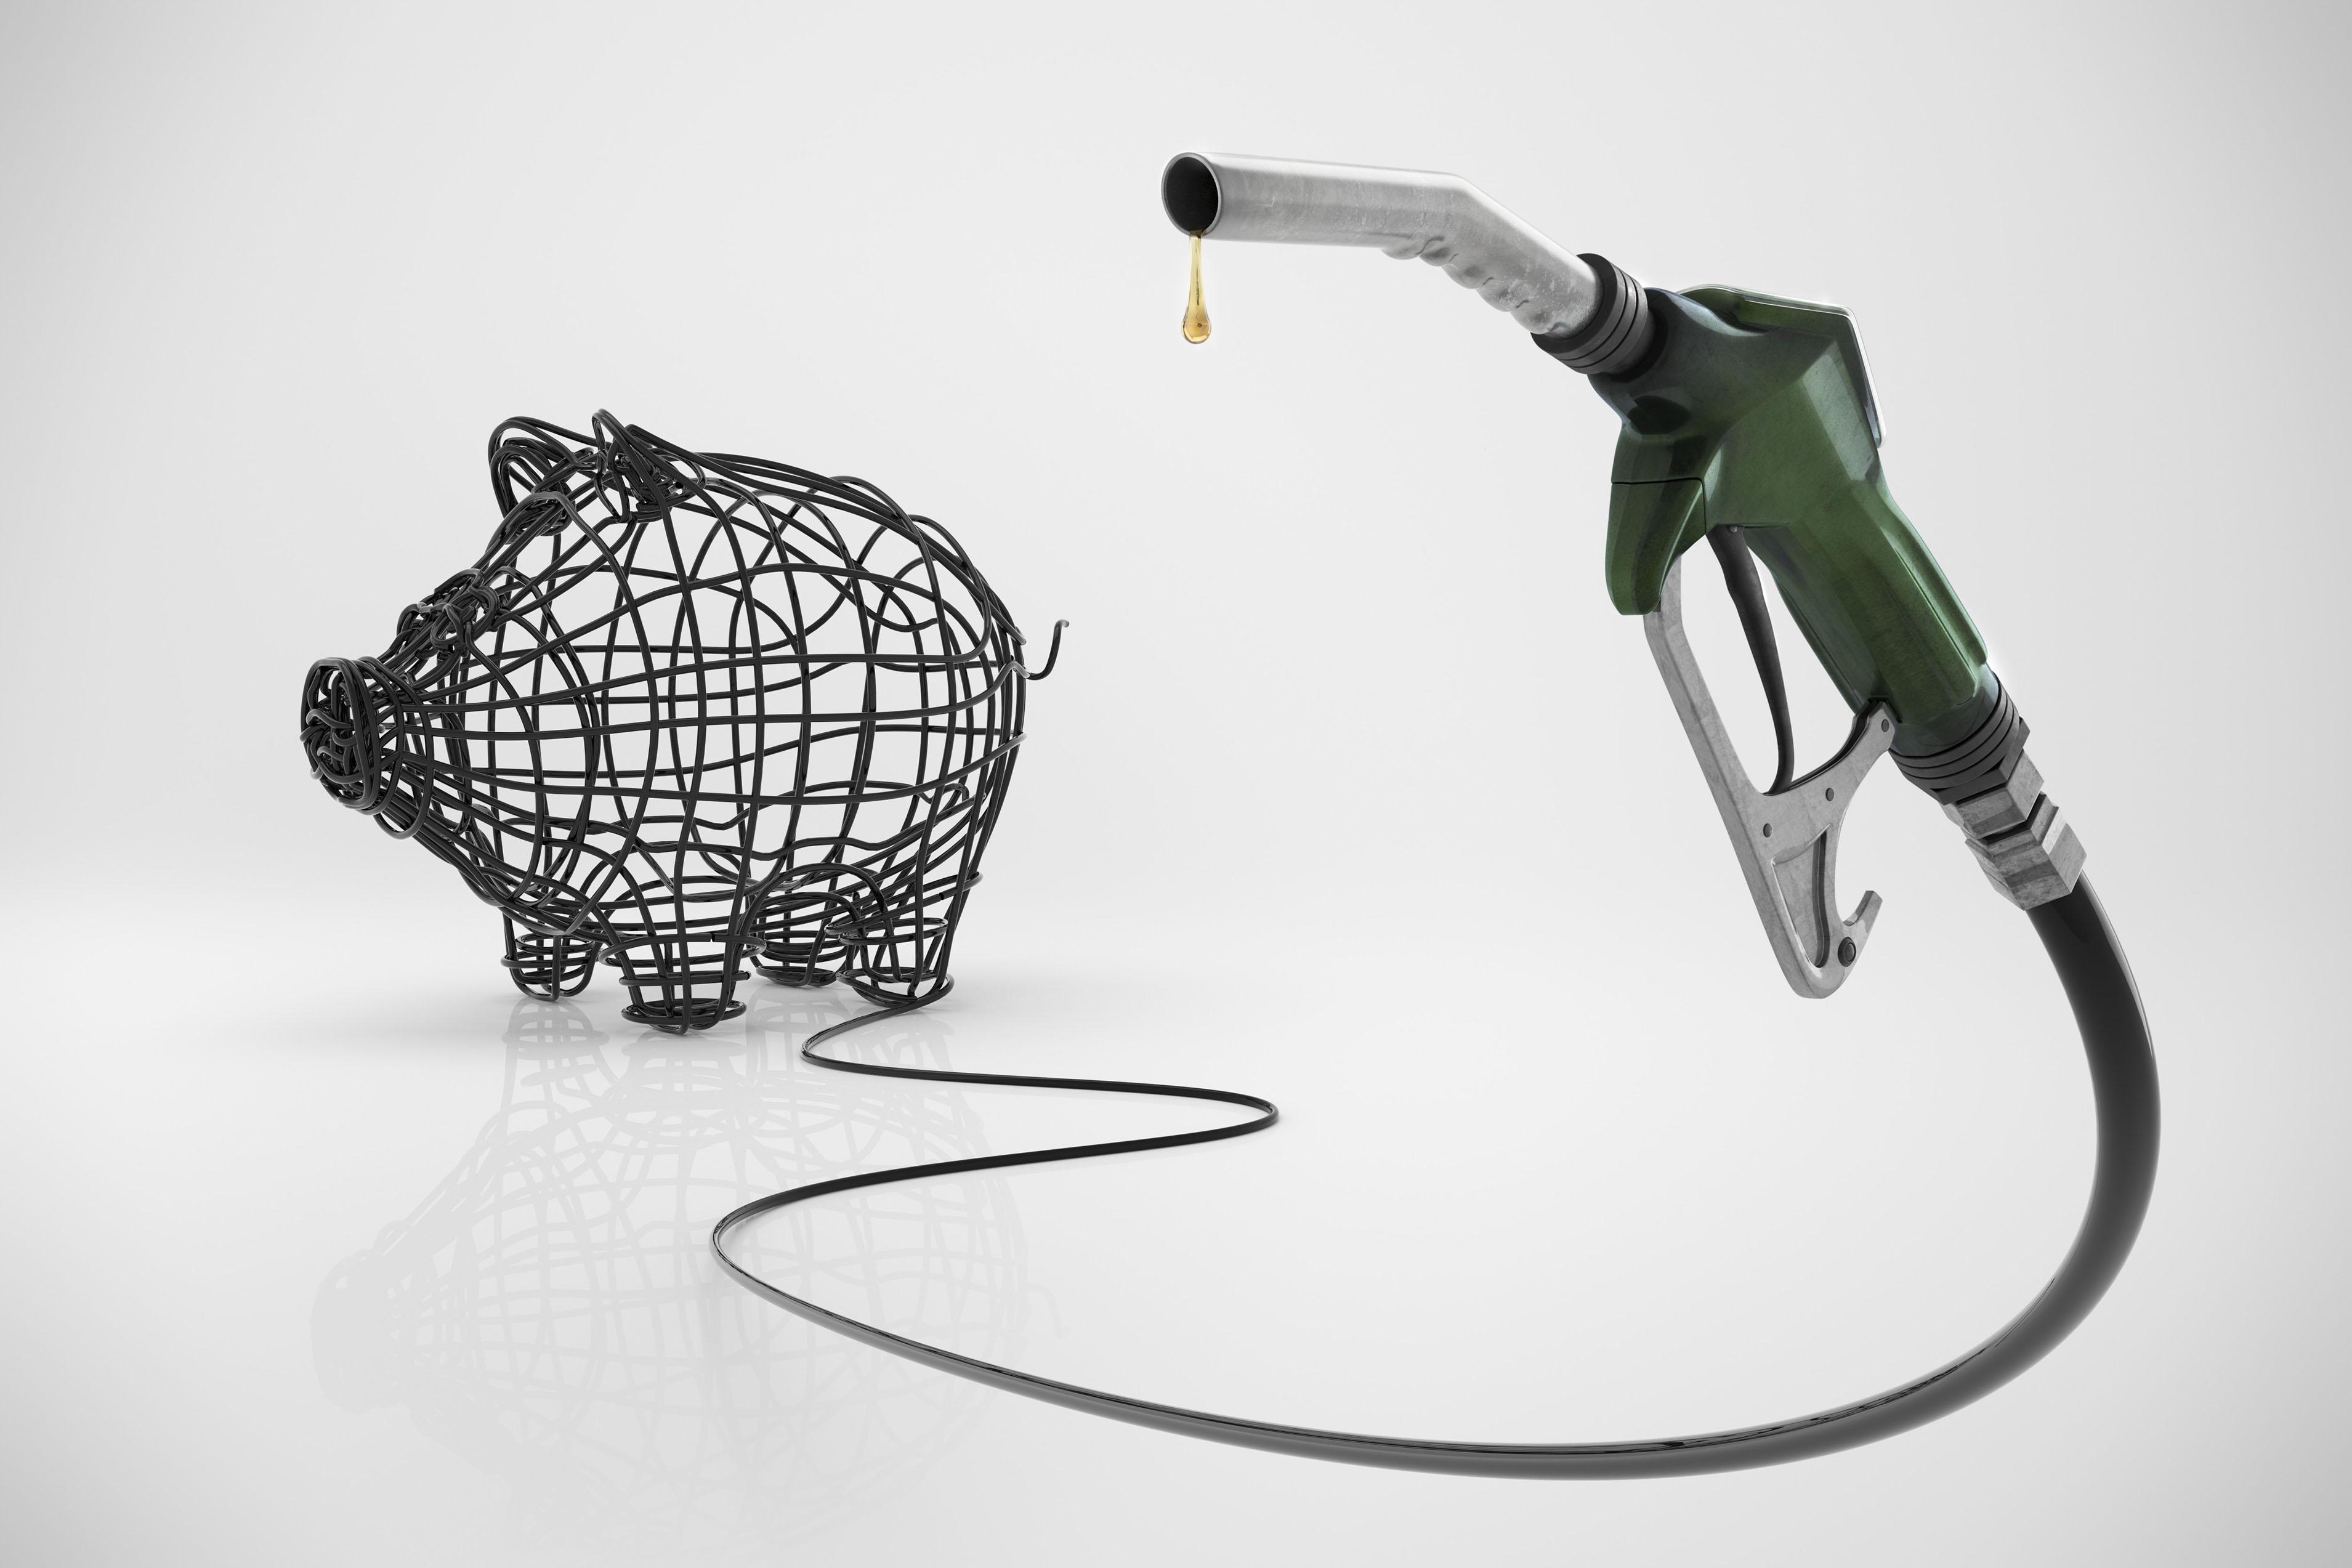 Fuel hose shaping piggybank